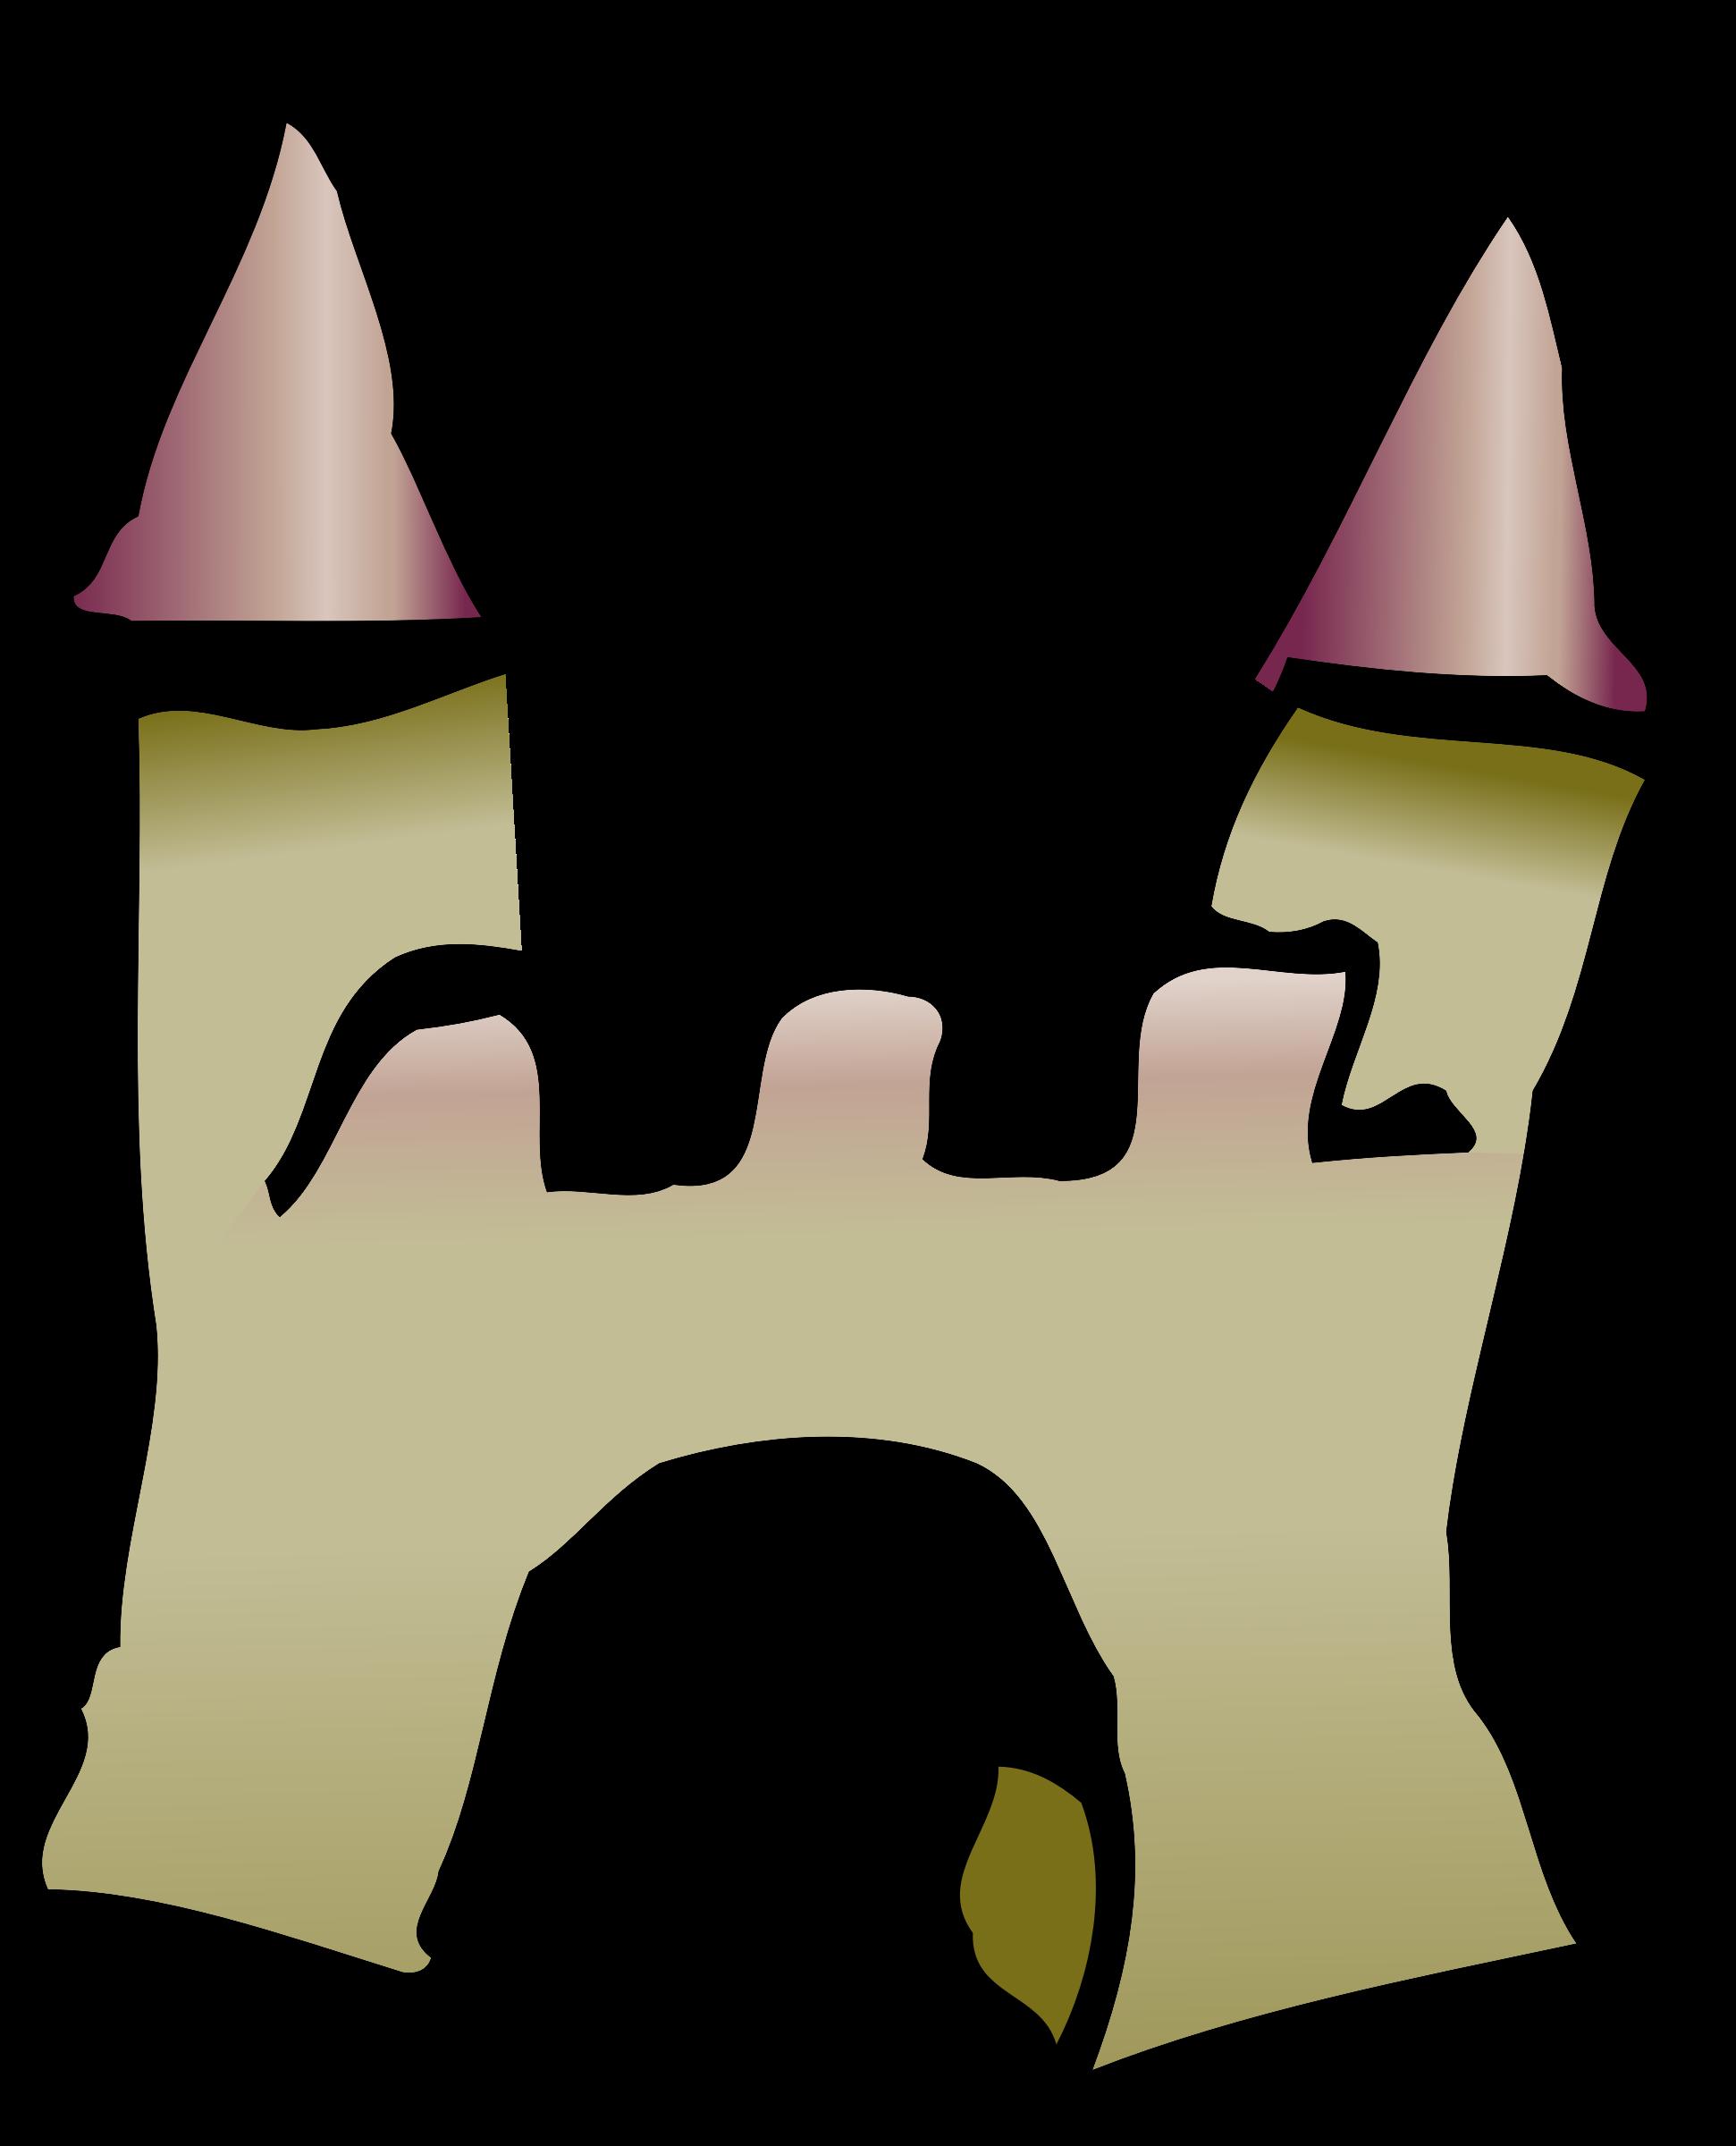 Clipart Castle Icon.